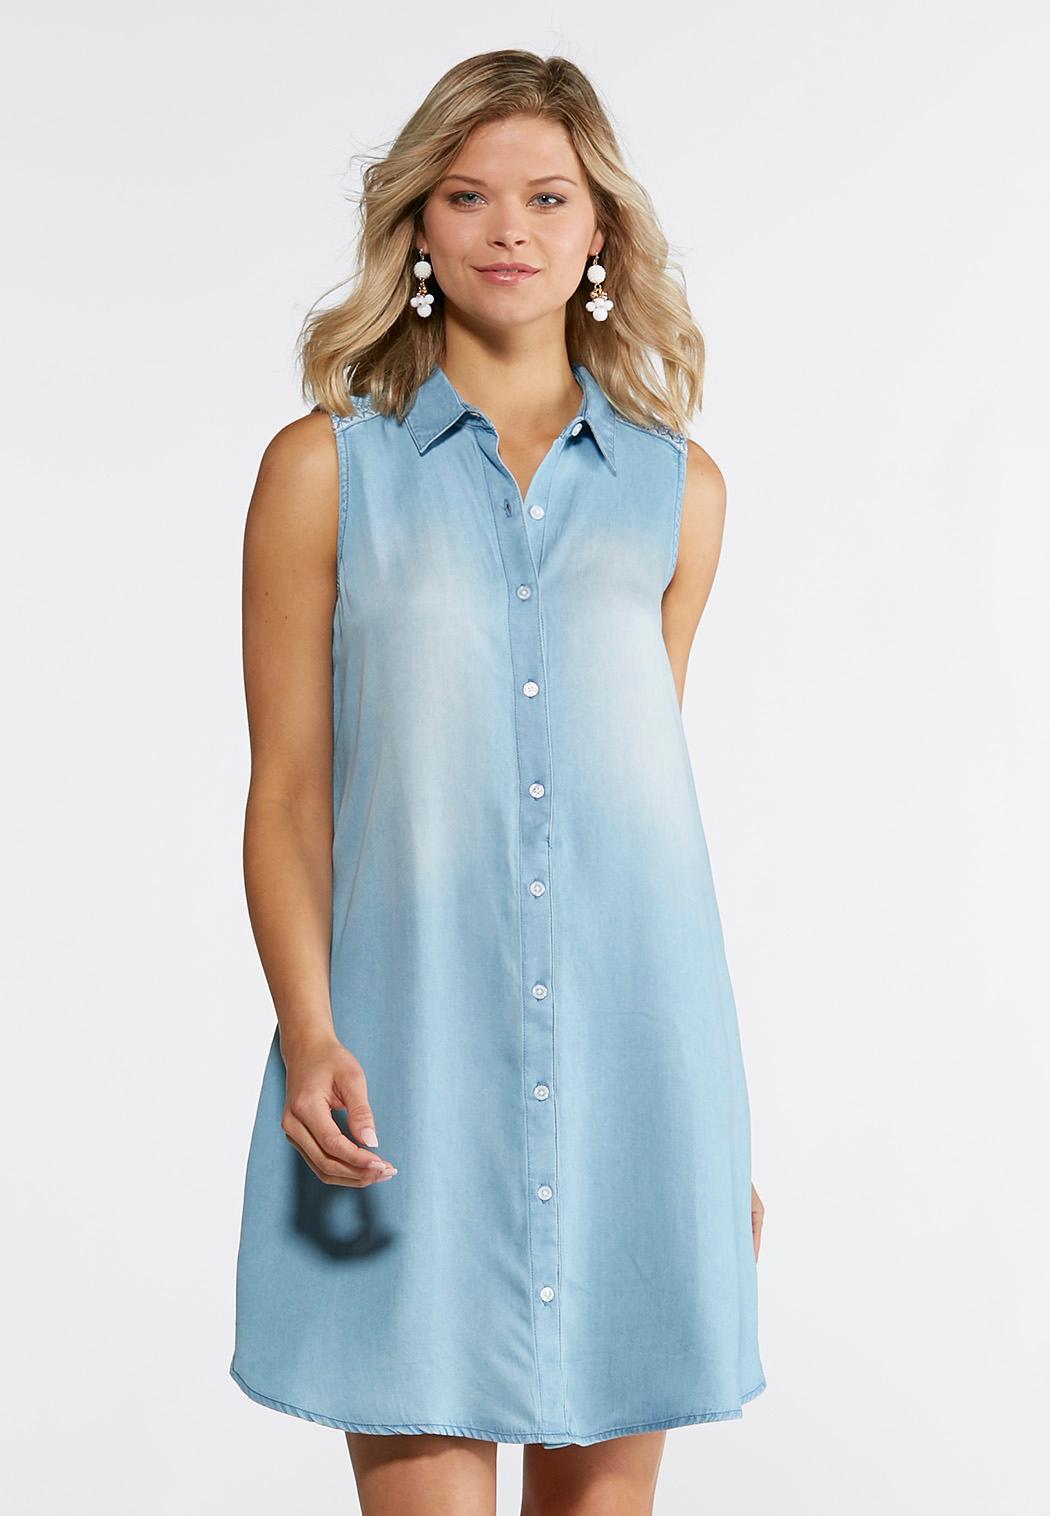 Plus Size Embroidered Back Chambray Shirt Dress Plus Sizes Cato Fashions